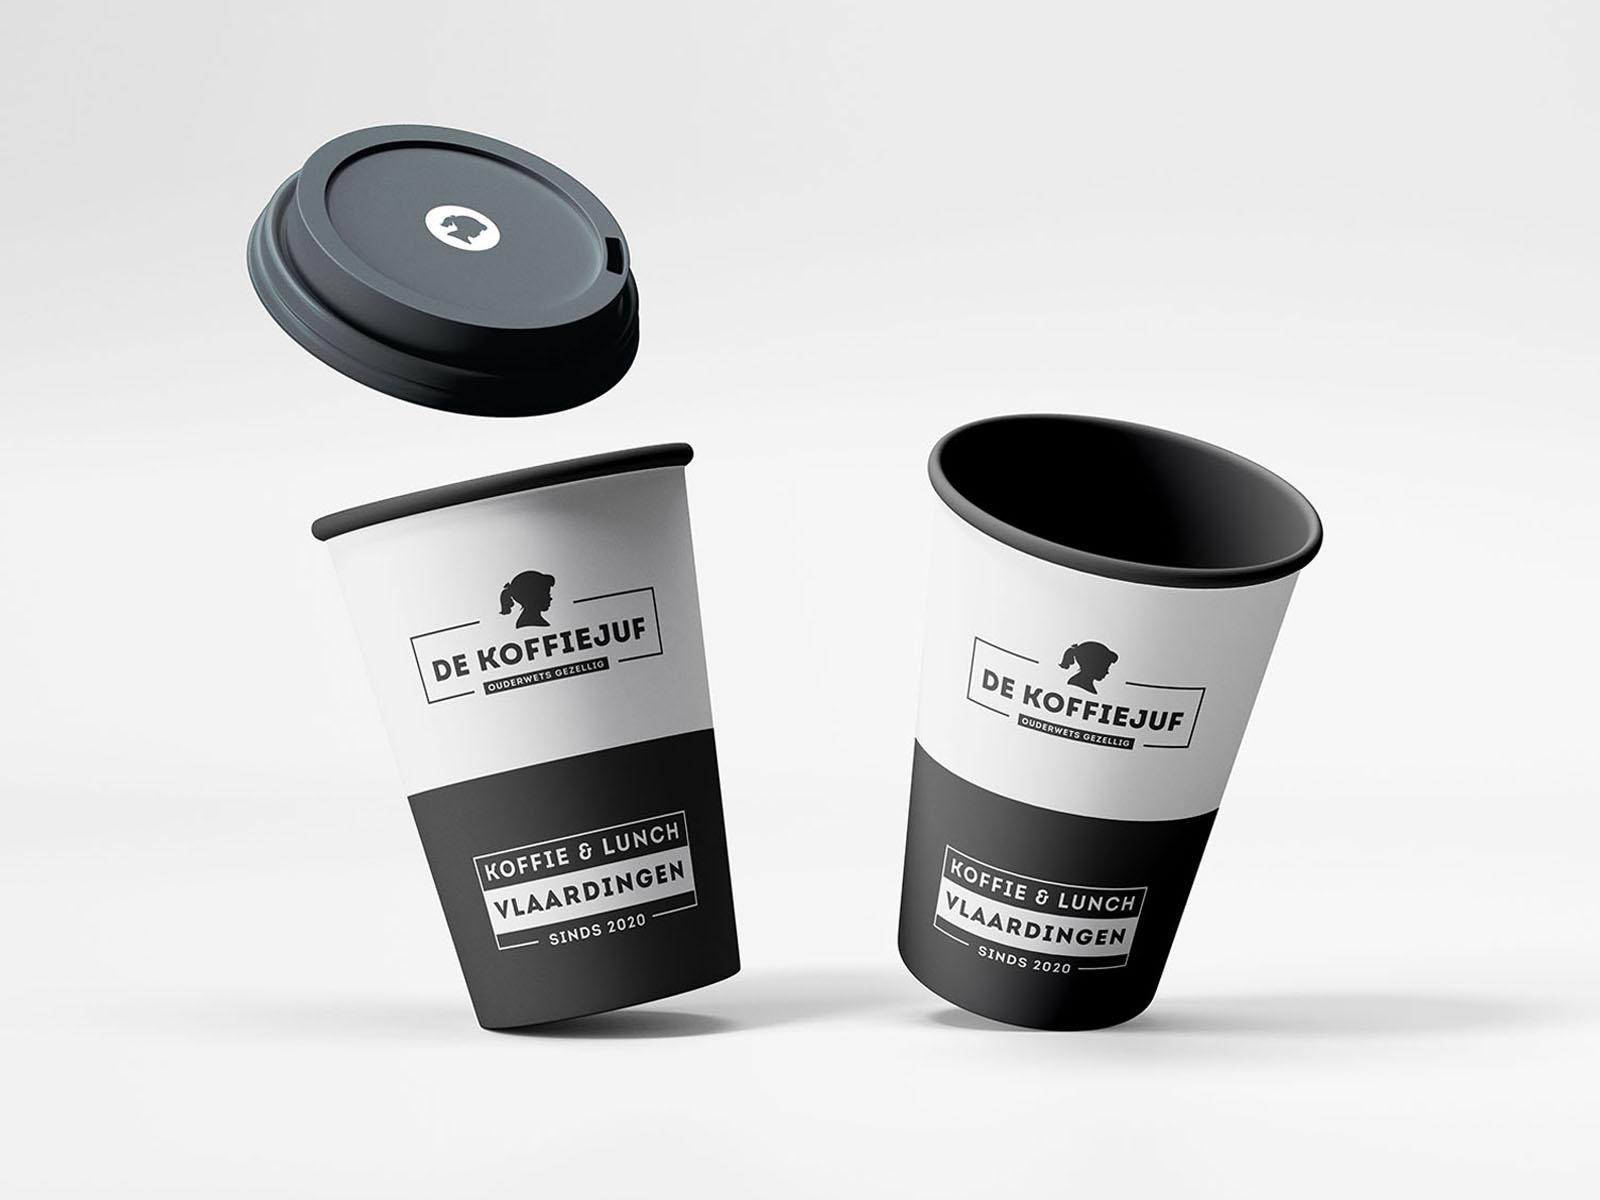 Koffie to go huisstijl-koffiezaak koffiebeker